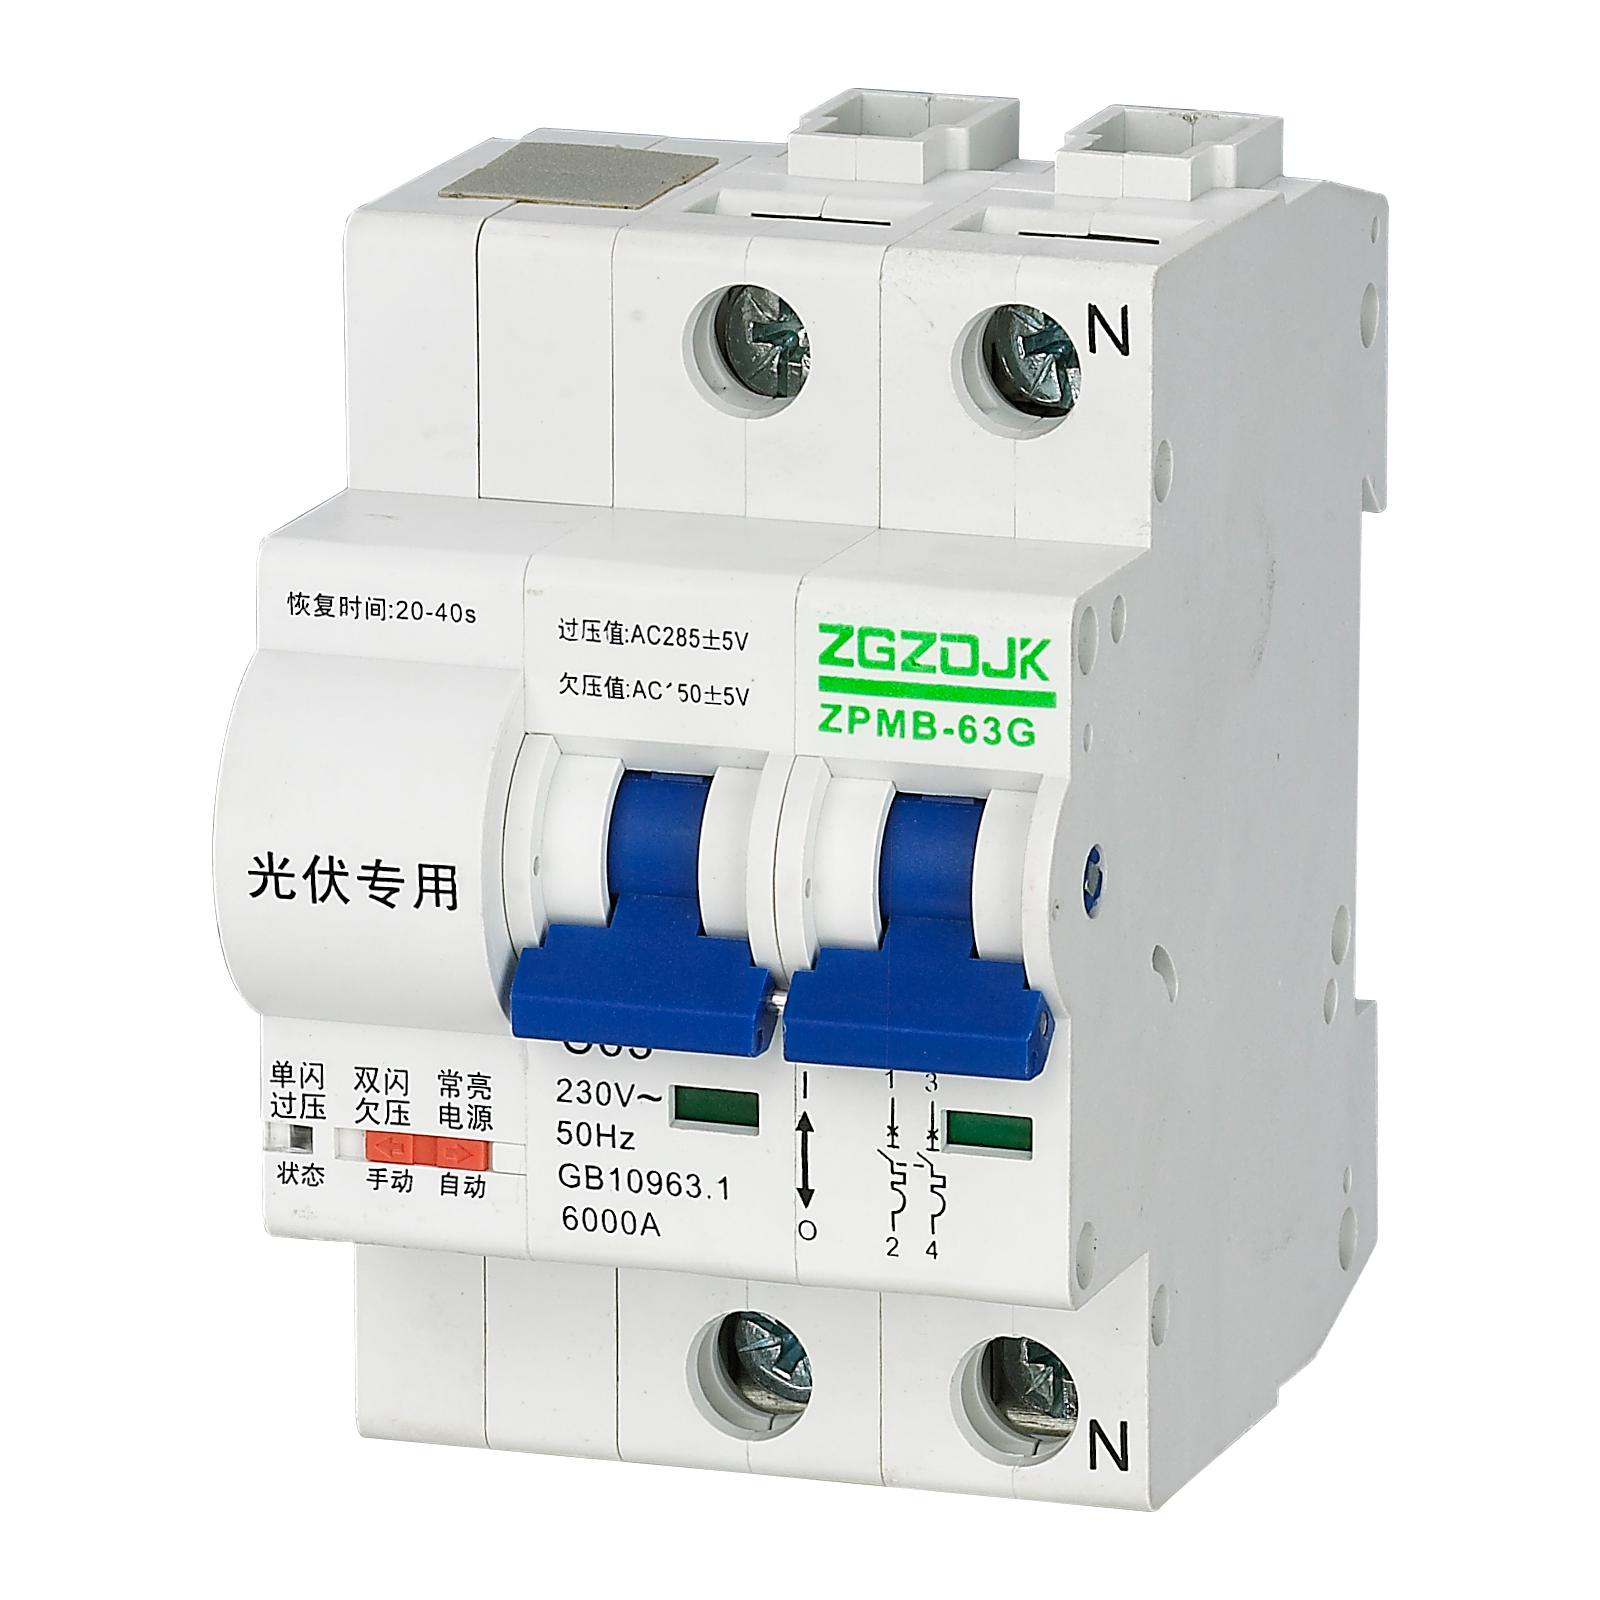 ZPMB-63G 光伏专用